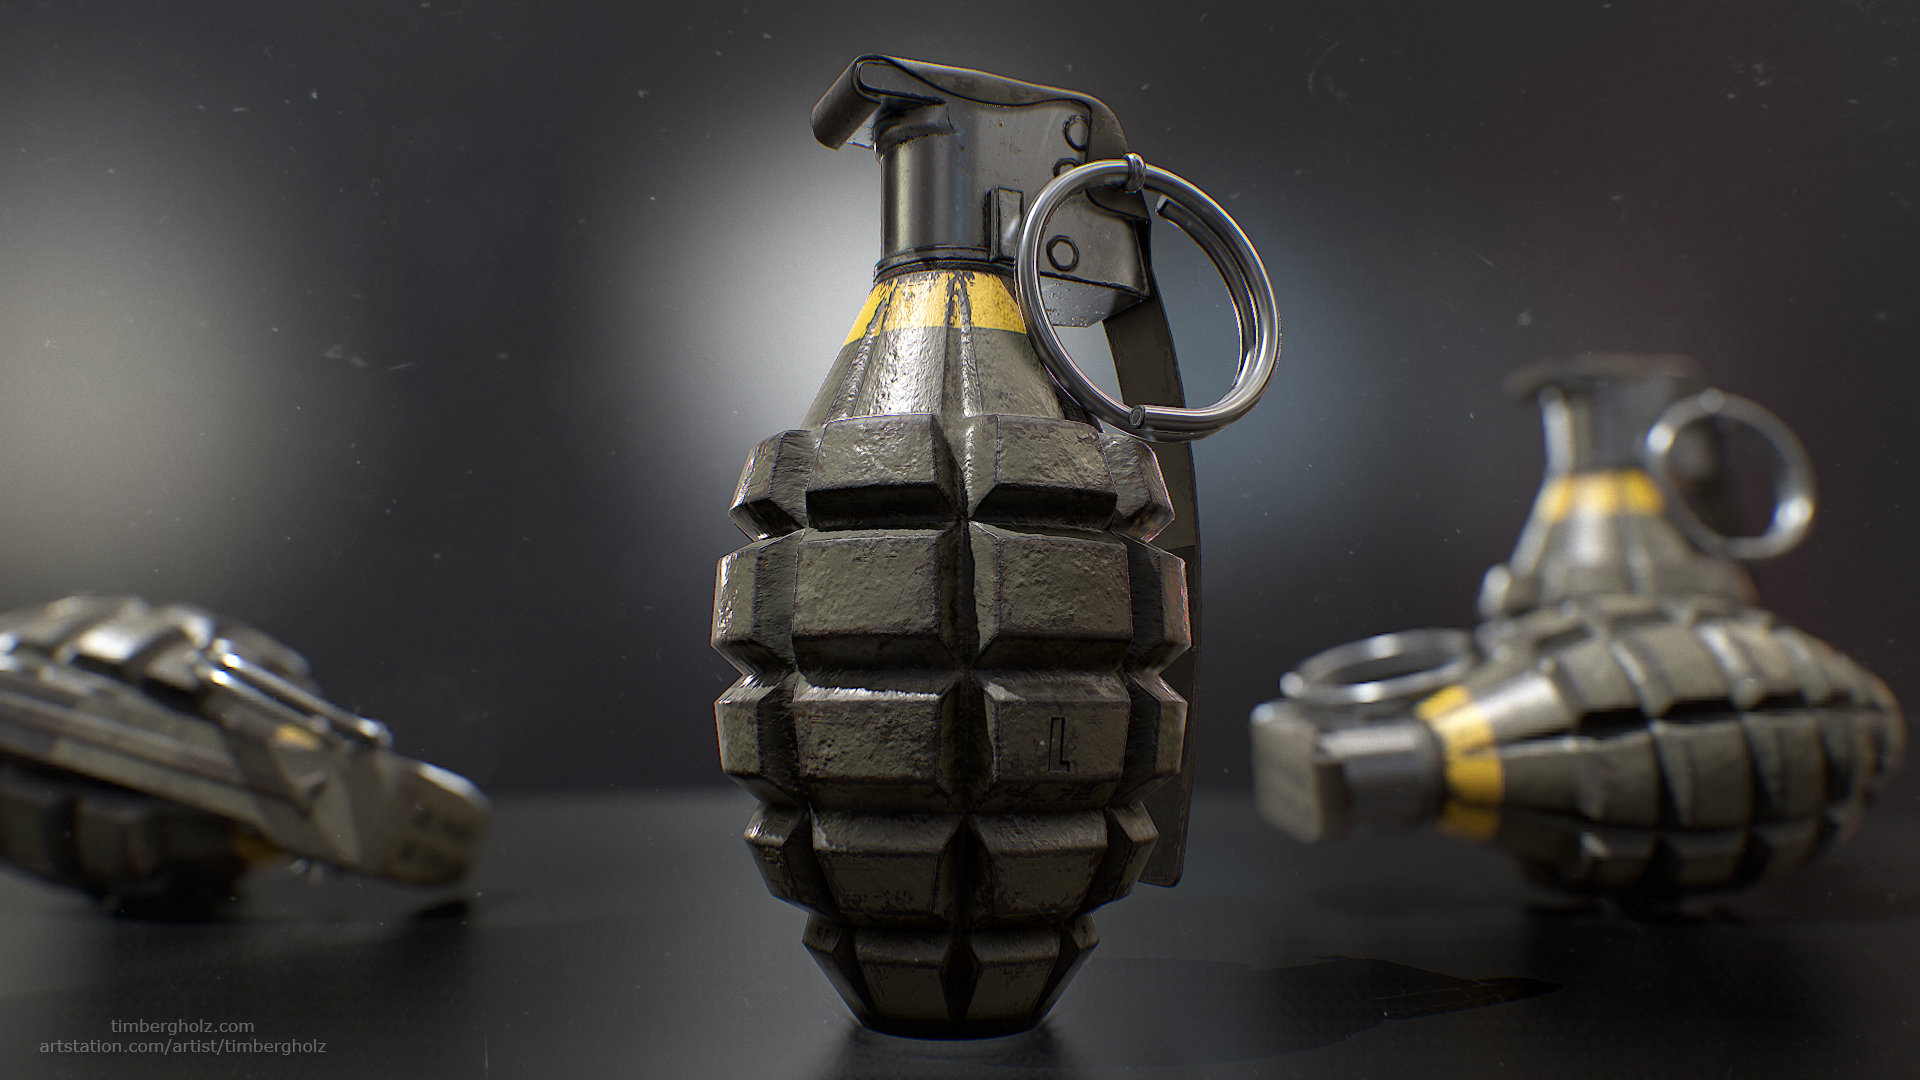 Tim bergholz mk2 grenade render 1